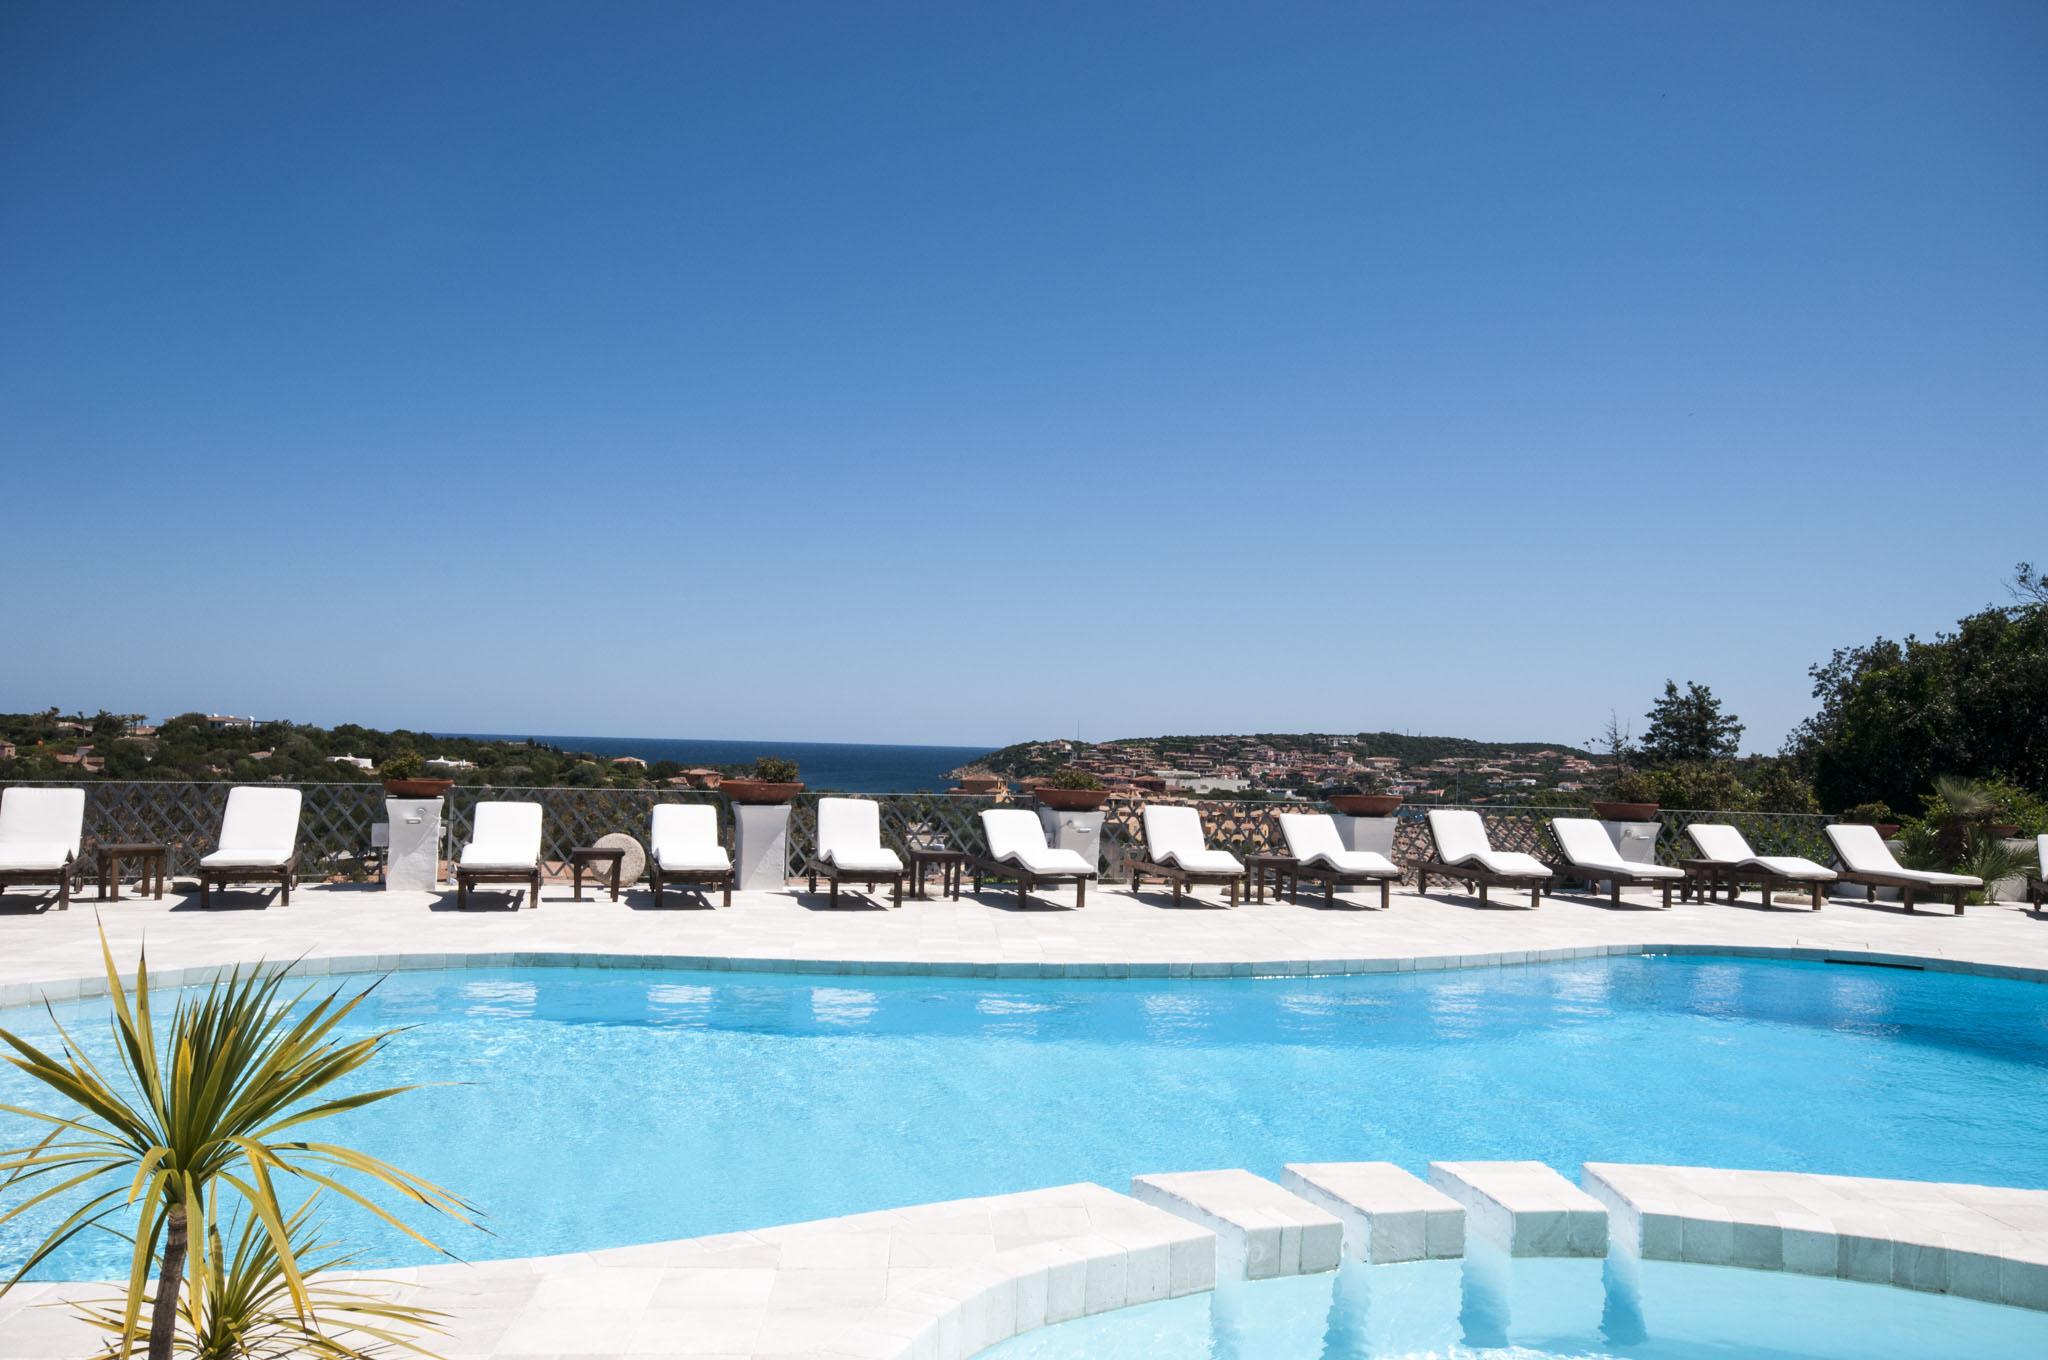 Hotel_Balocco_pool